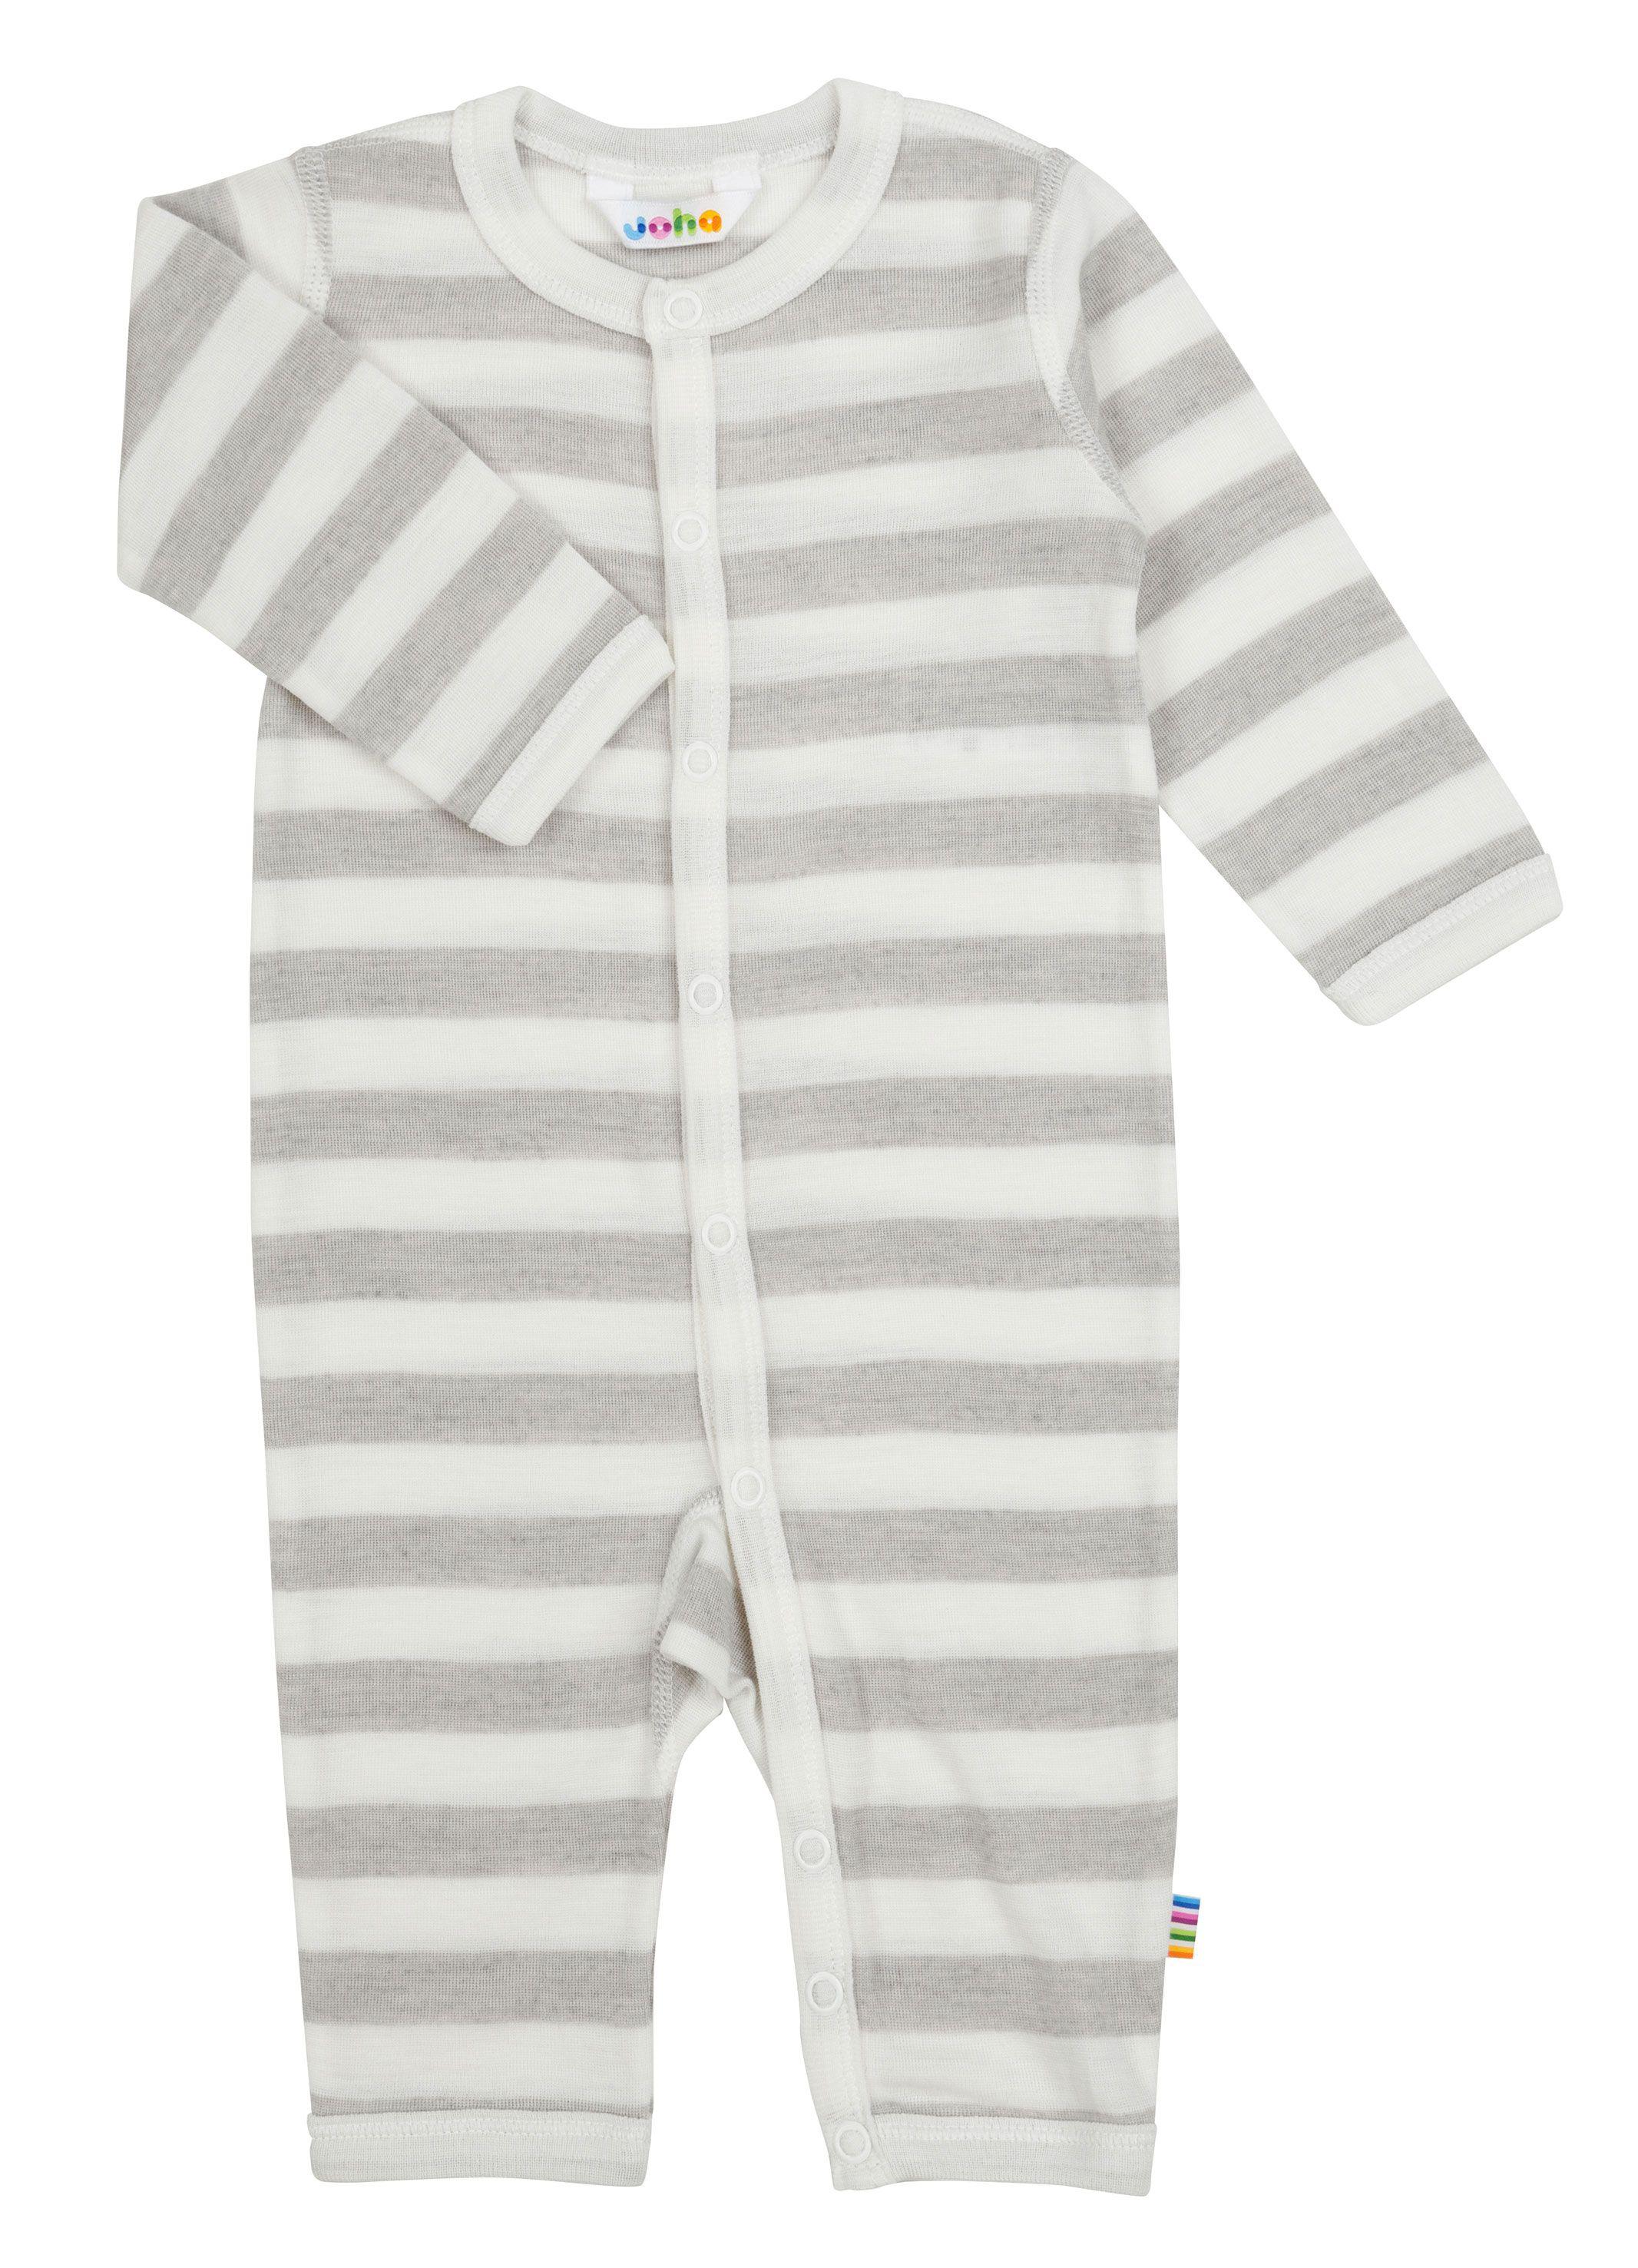 Image of   Heldragt fra Joha i uld-silke m. White-grey stripe